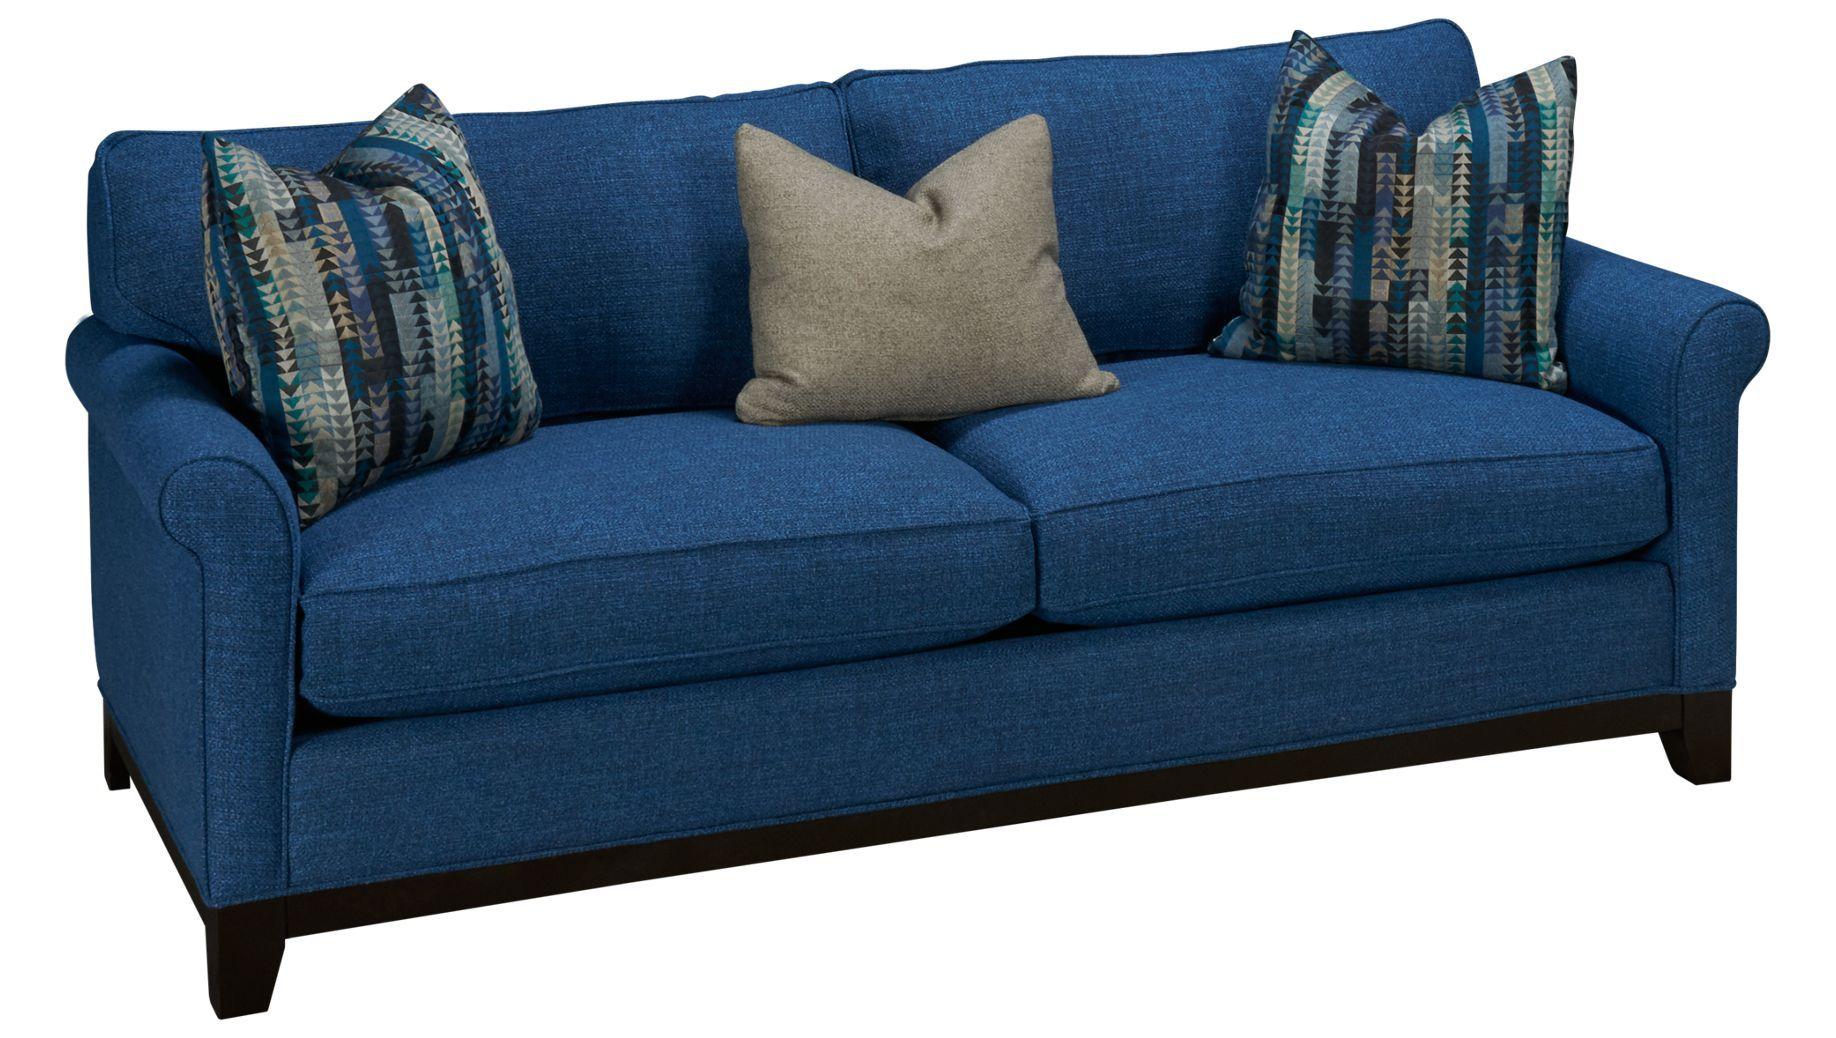 Fantastic Jonathan Louis Studio Studio Sofa Jordans Furniture Alphanode Cool Chair Designs And Ideas Alphanodeonline